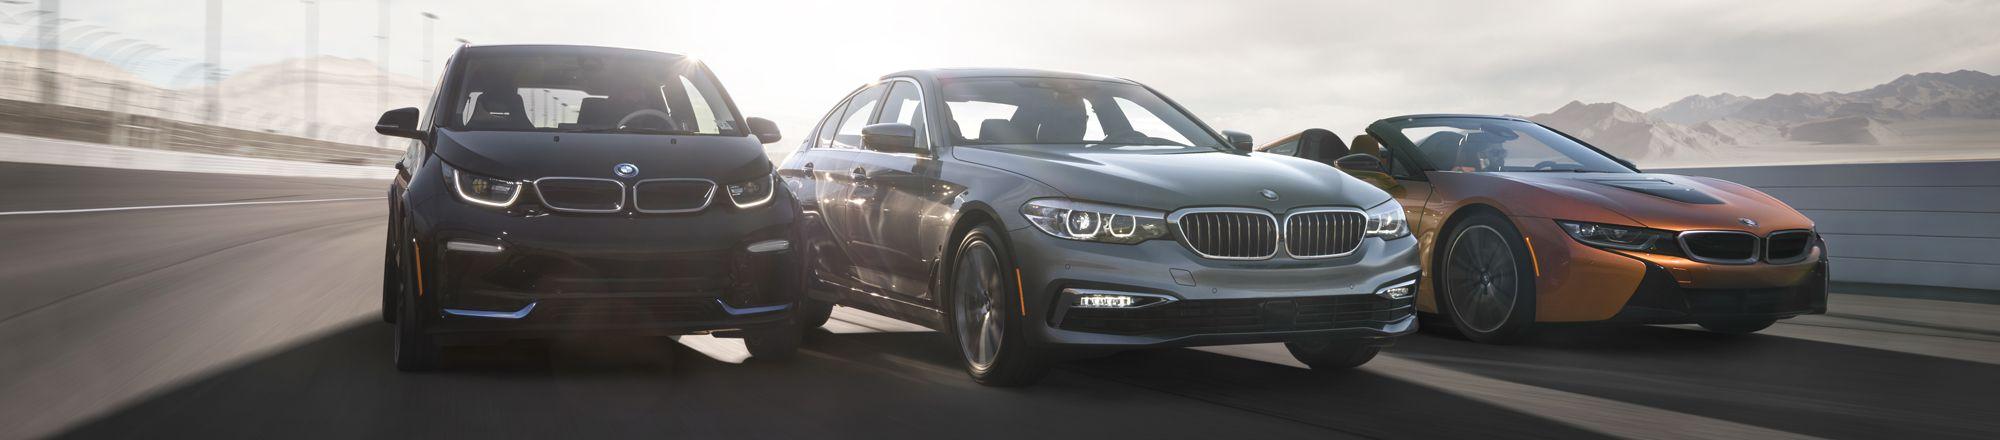 BMW of Bloomfield Fleet Corporate Program